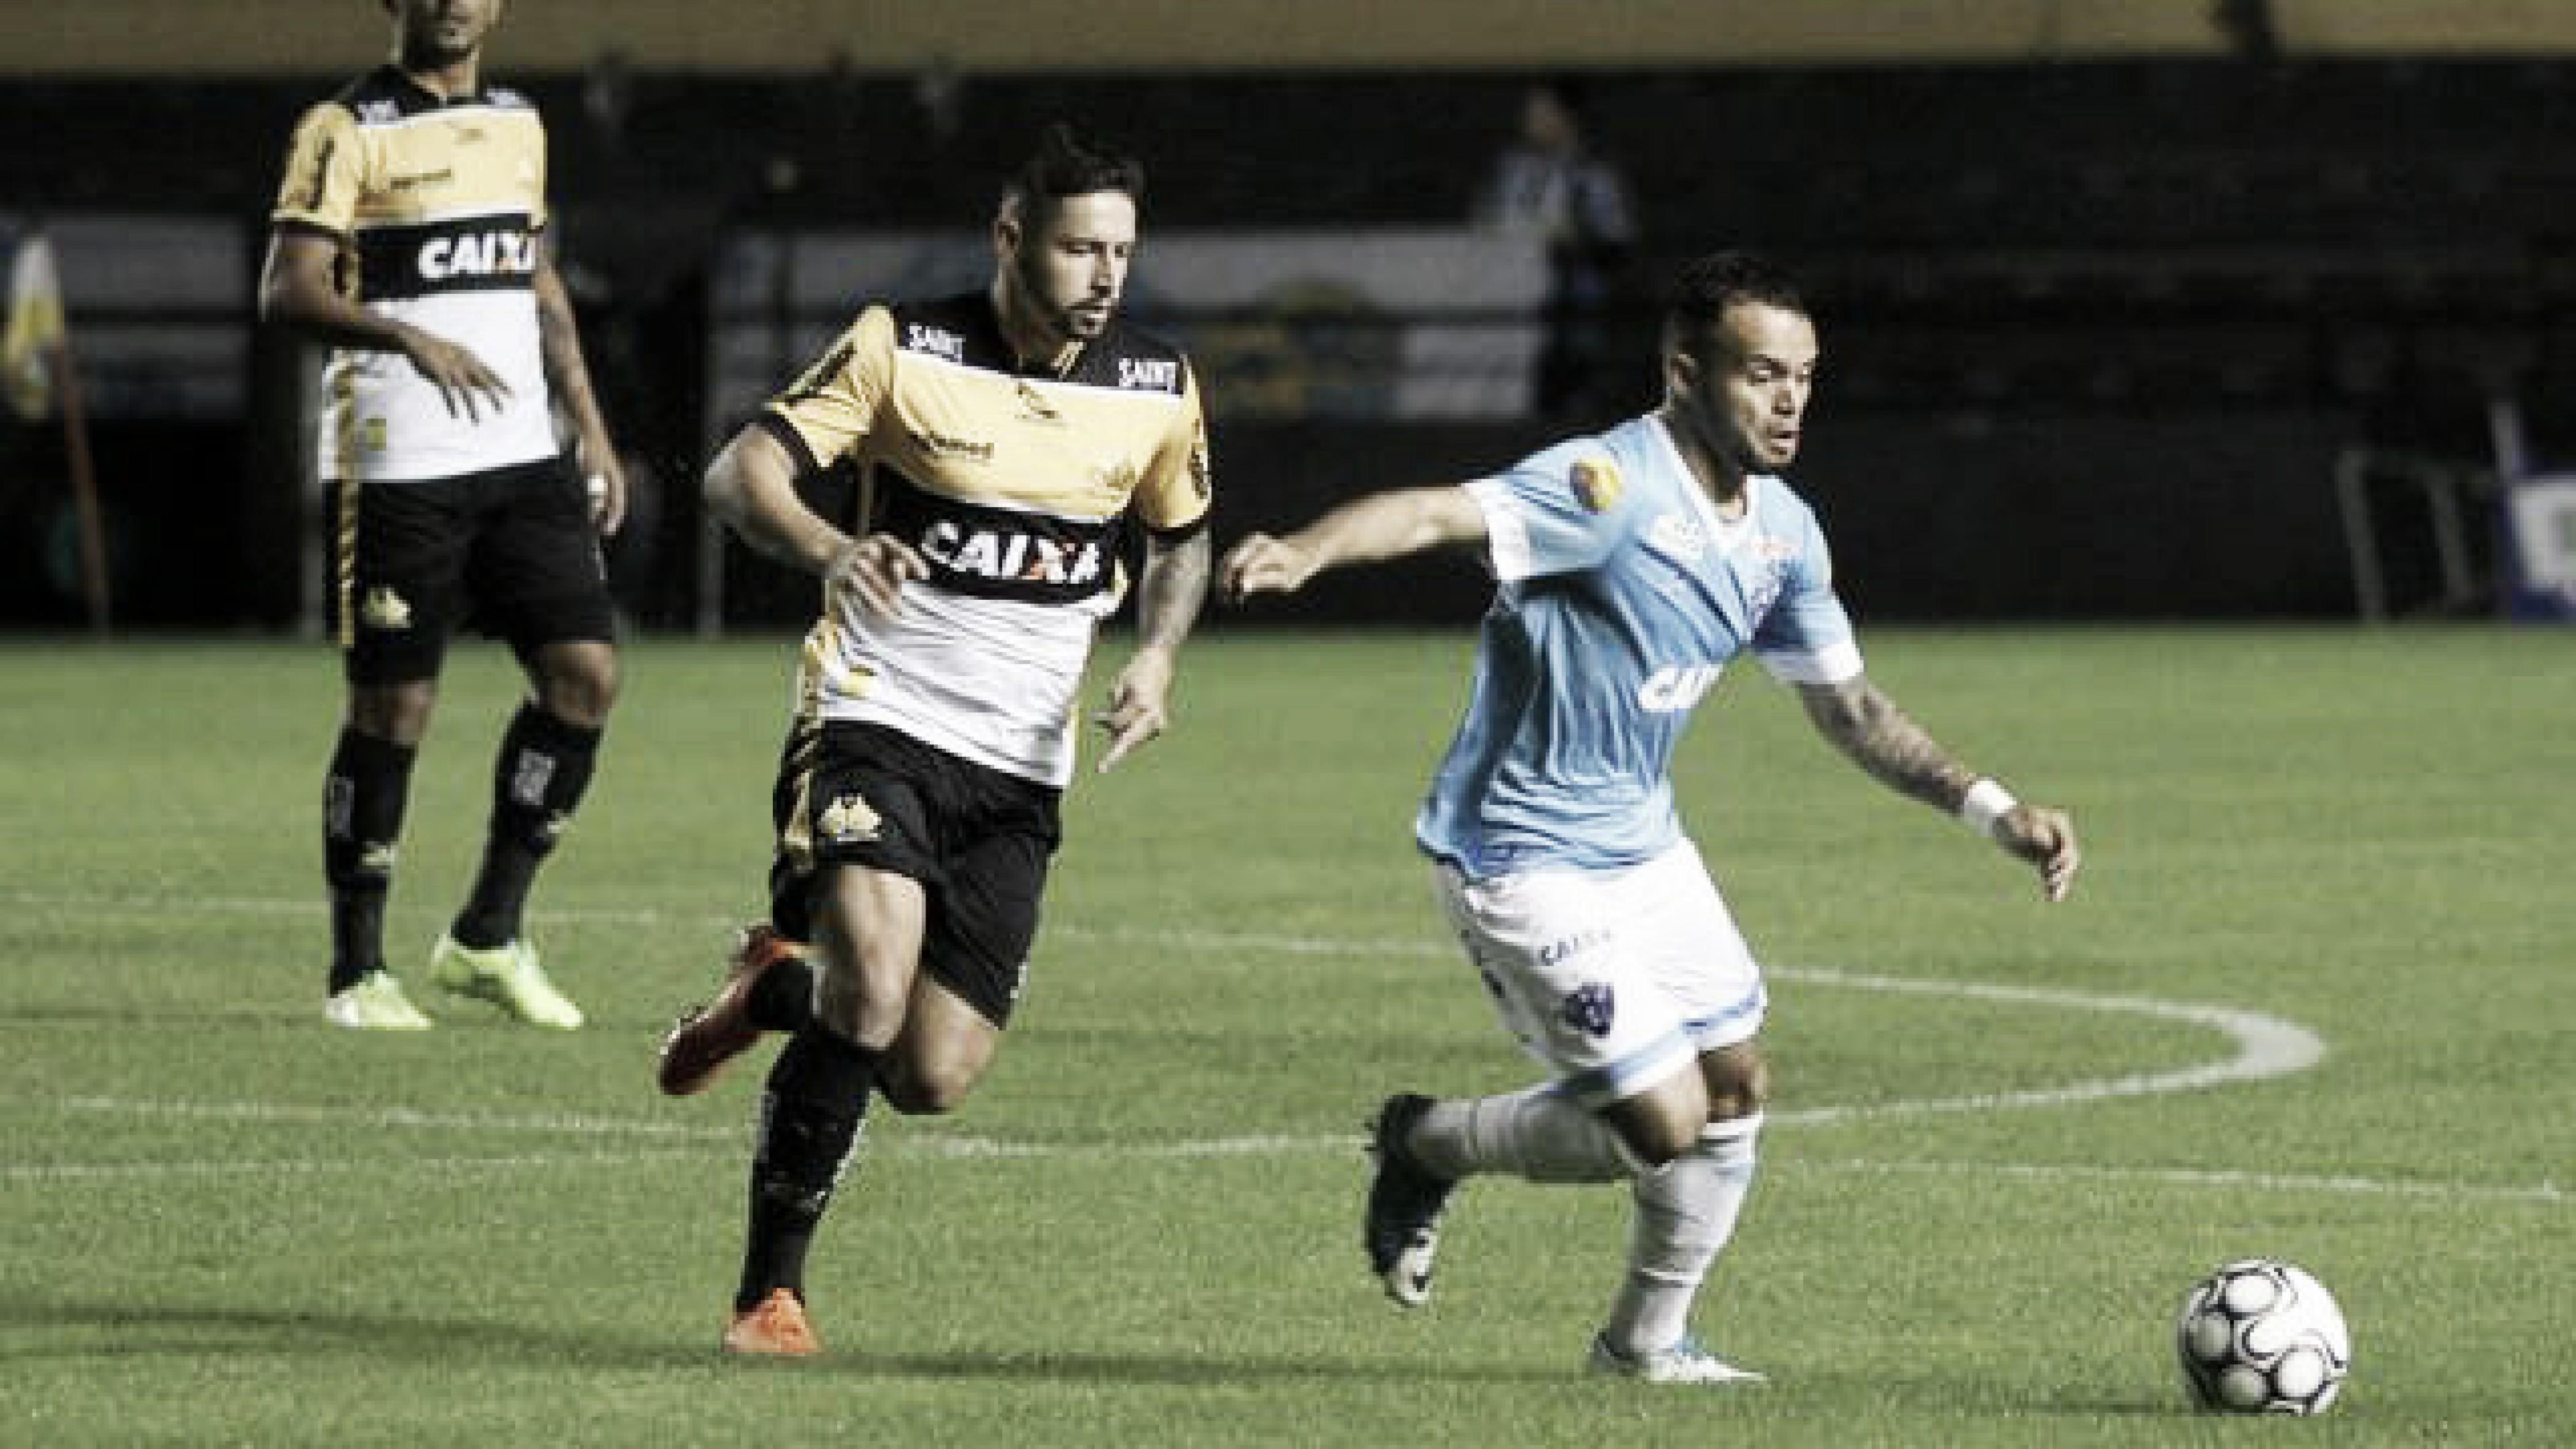 Paysandu recebe Criciúma lutando pela permanência na Série B